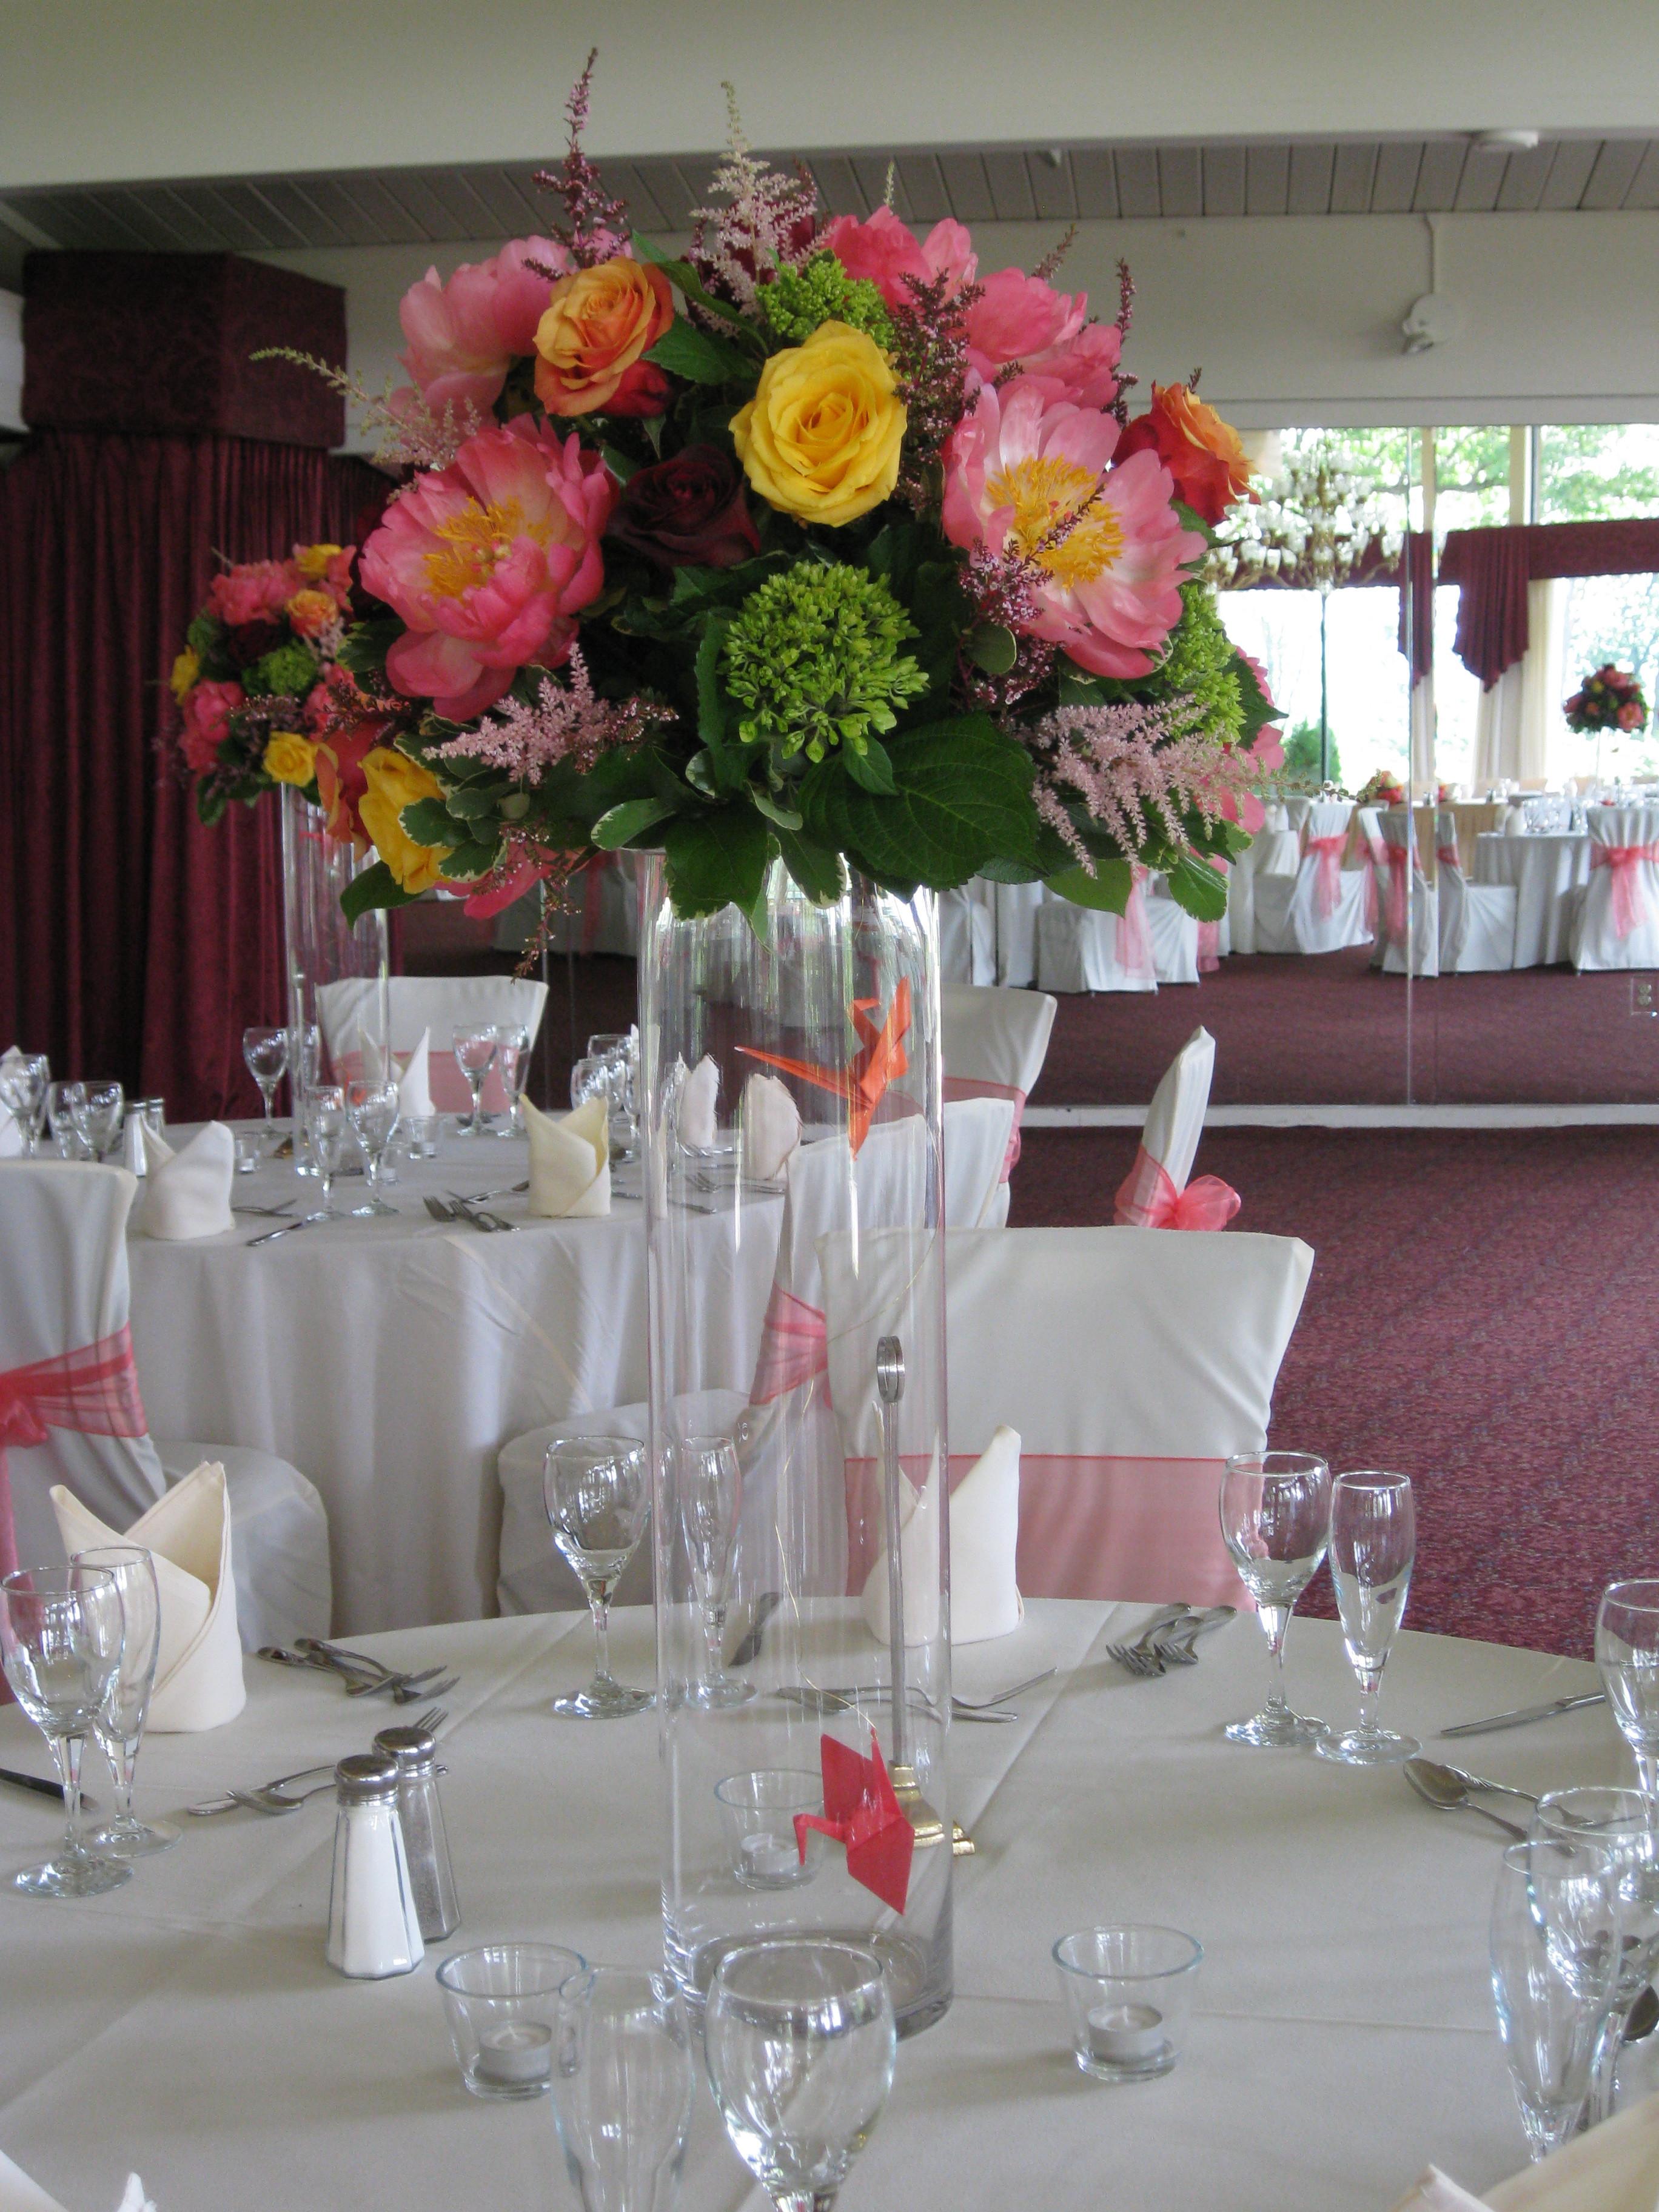 10 Stylish Flower Arrangements In Square Glass Vases Decorative